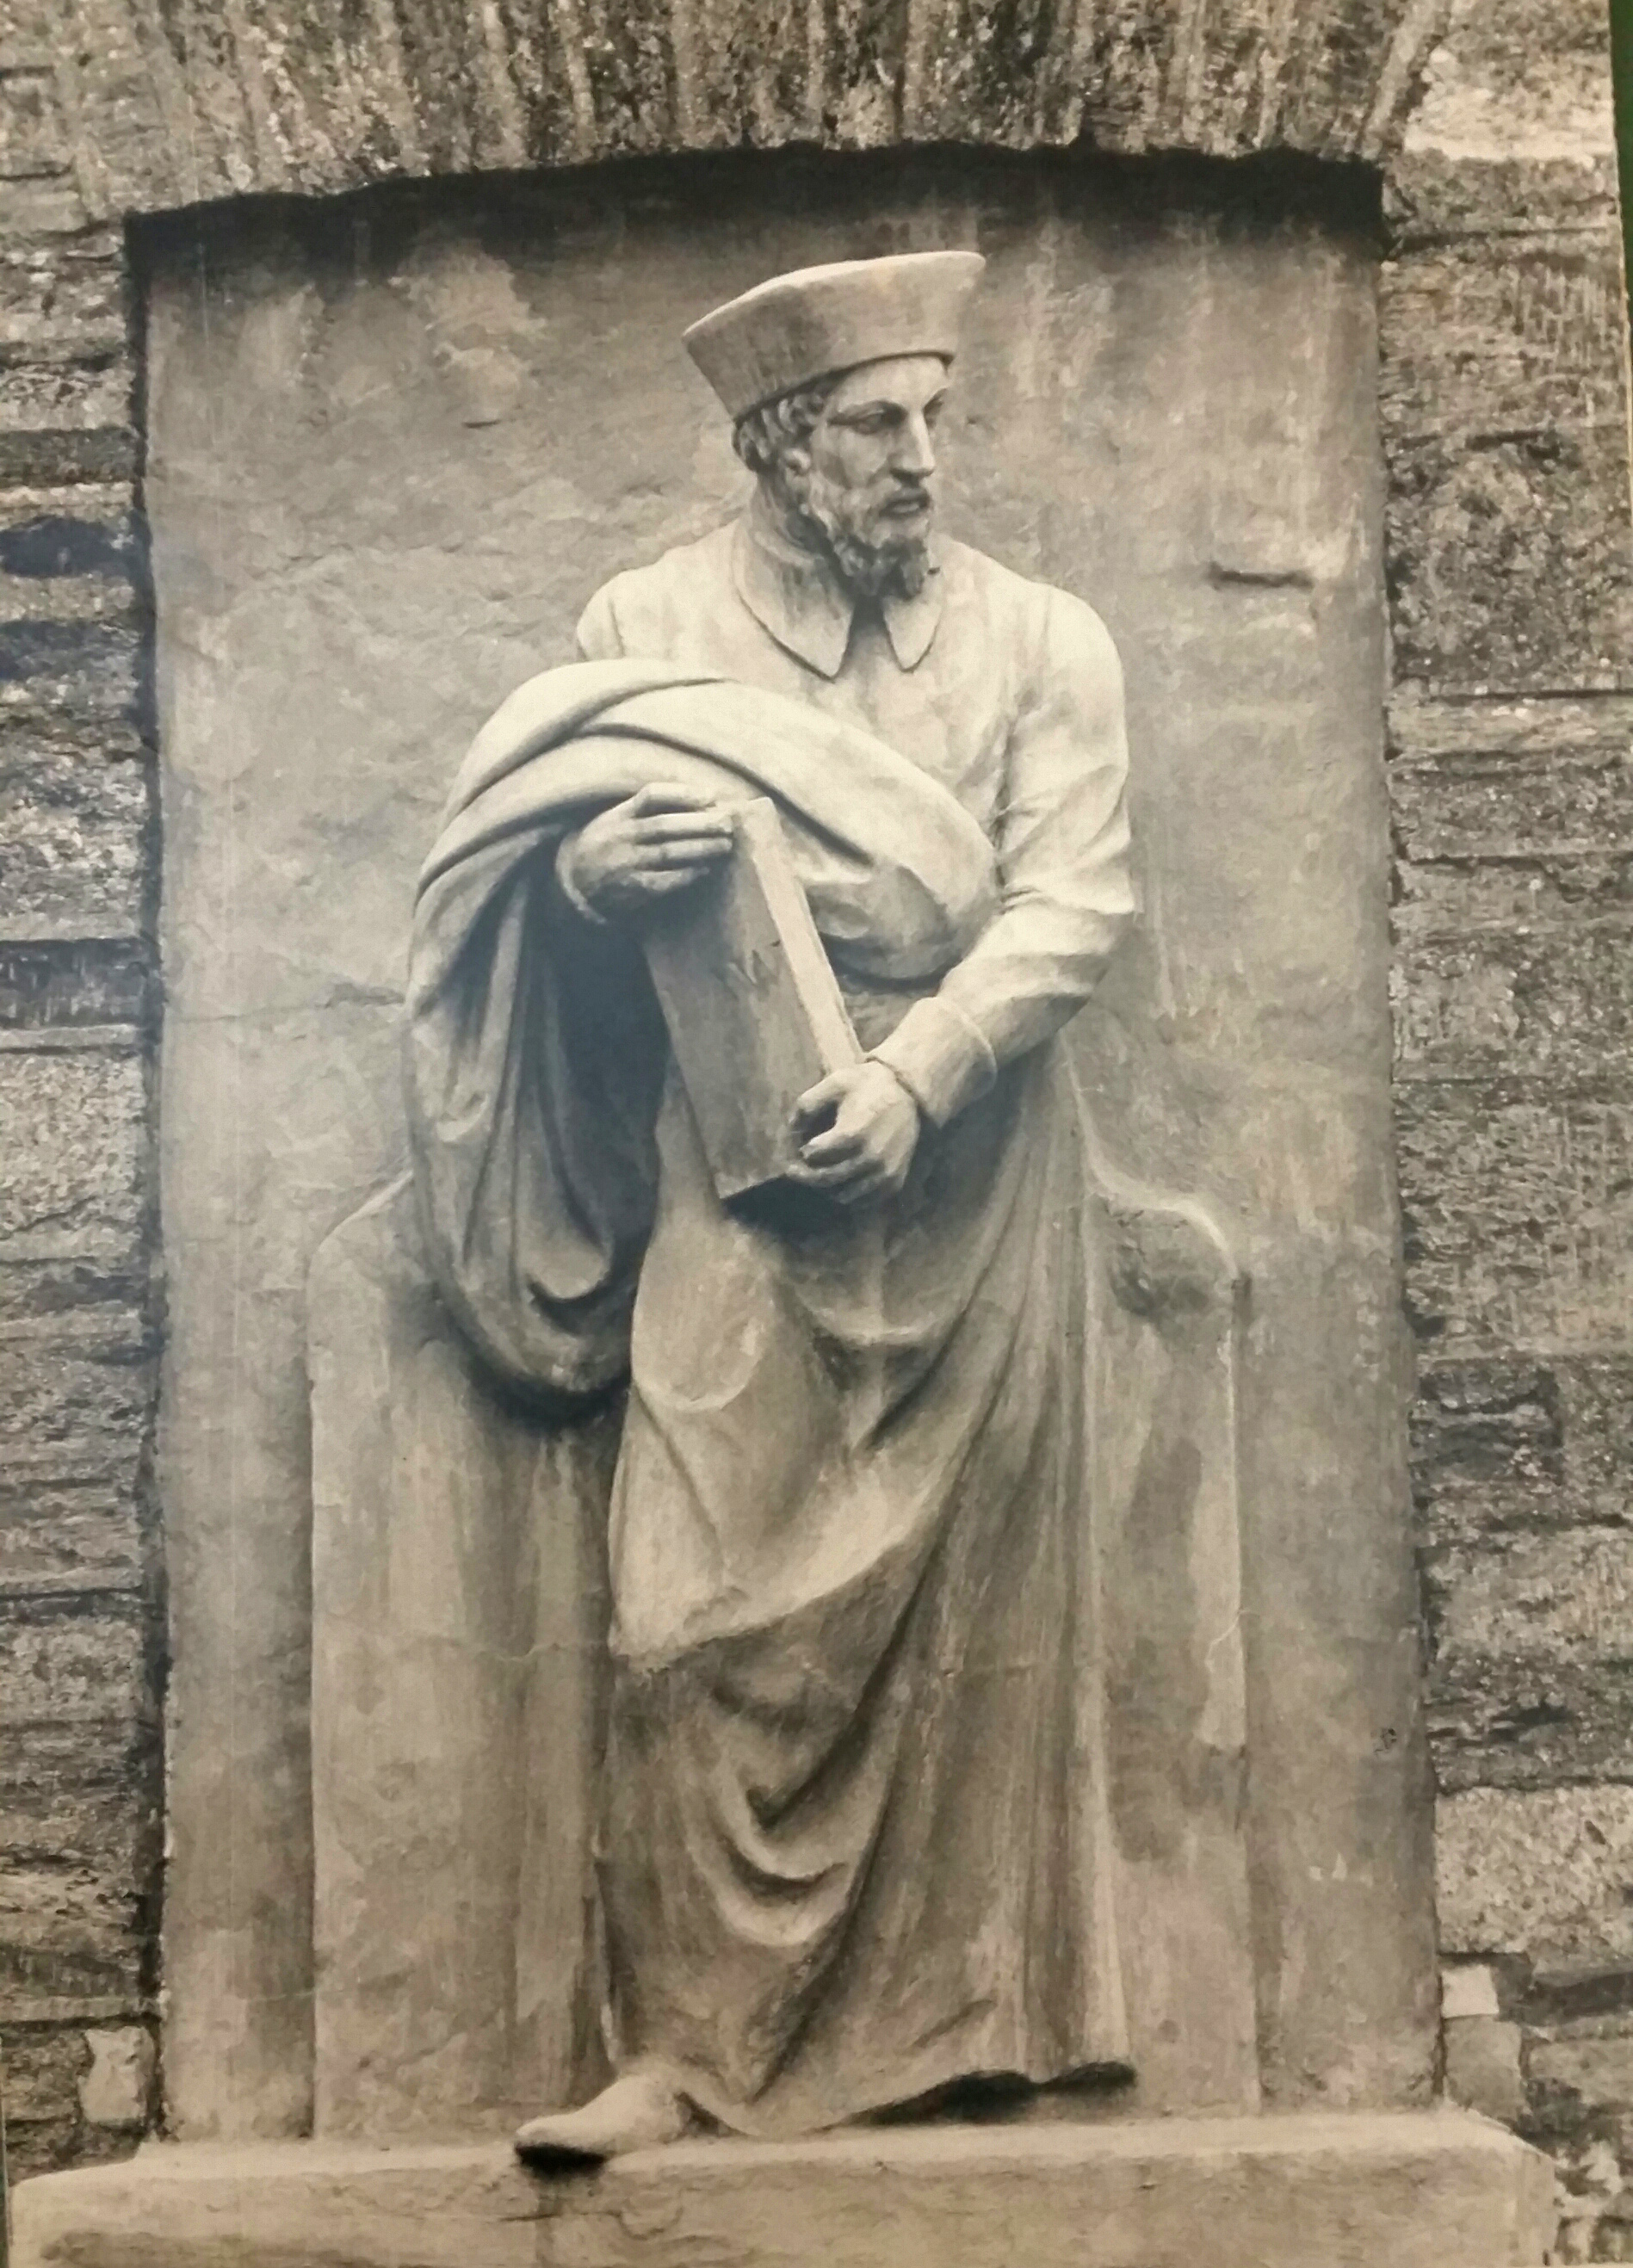 West Street Statue 1851